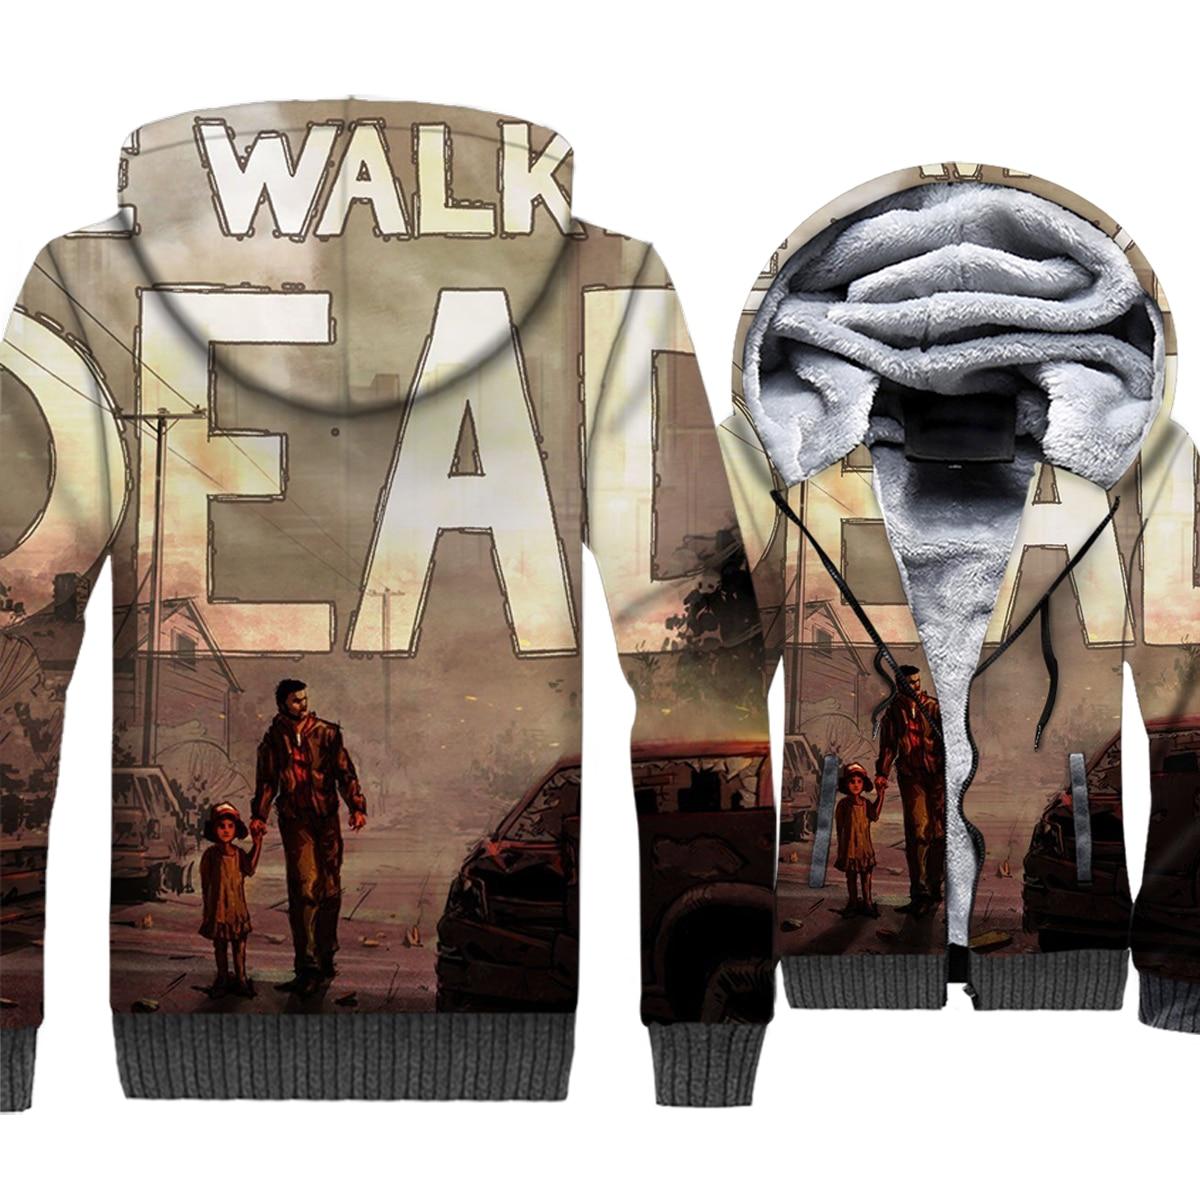 New Arrival Men 39 s Sweatshirts For Autumn Winter Zipped Coat 2018 Hot Fashion Hip Hop Hoodie The Walking Dead Men 39 s Hoddies Tops in Hoodies amp Sweatshirts from Men 39 s Clothing